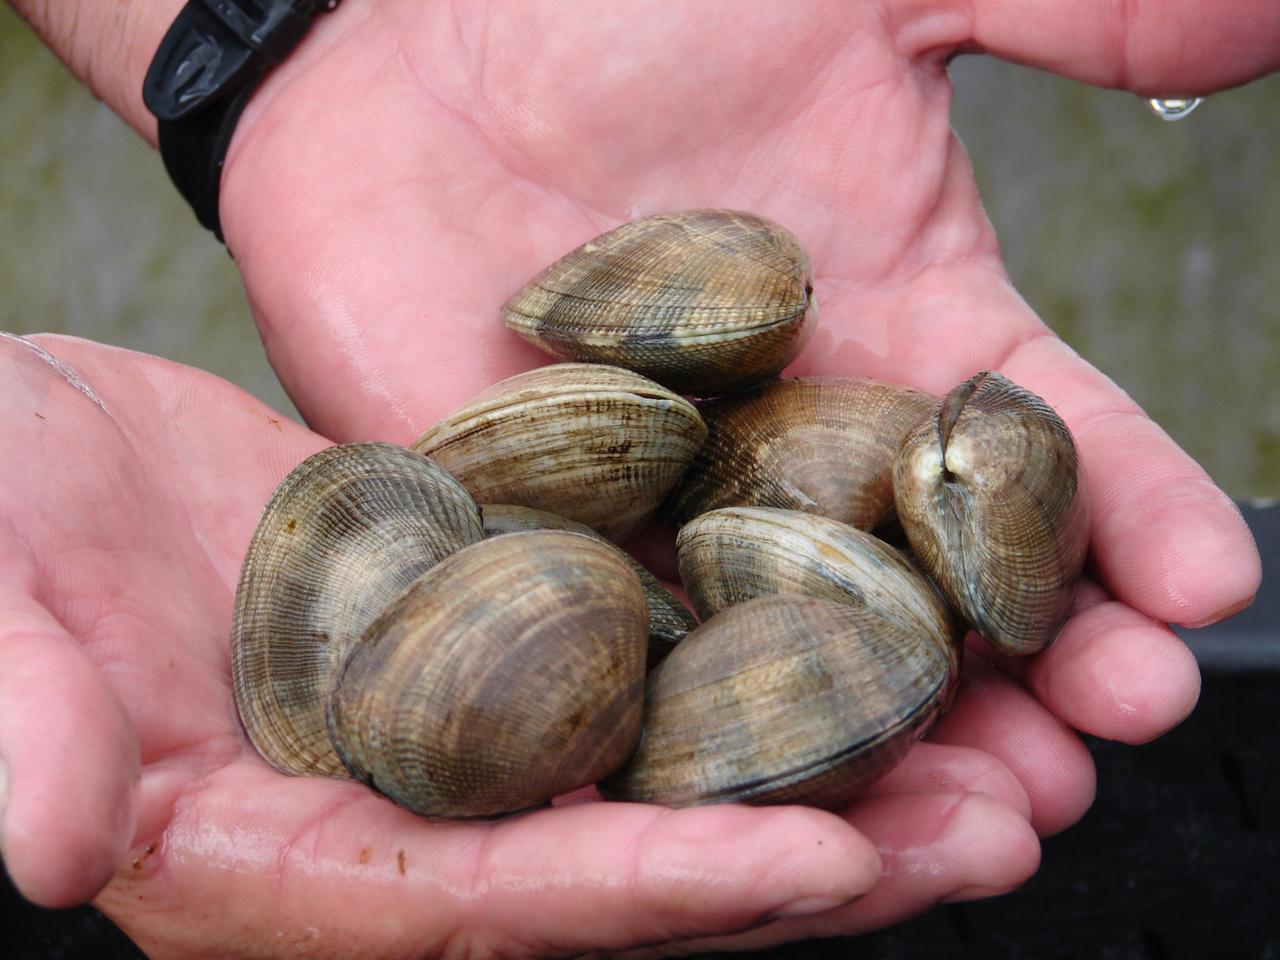 2592x1944-hawaii-aquaculturetour-manilaclams-NOAA-Policy.jpg